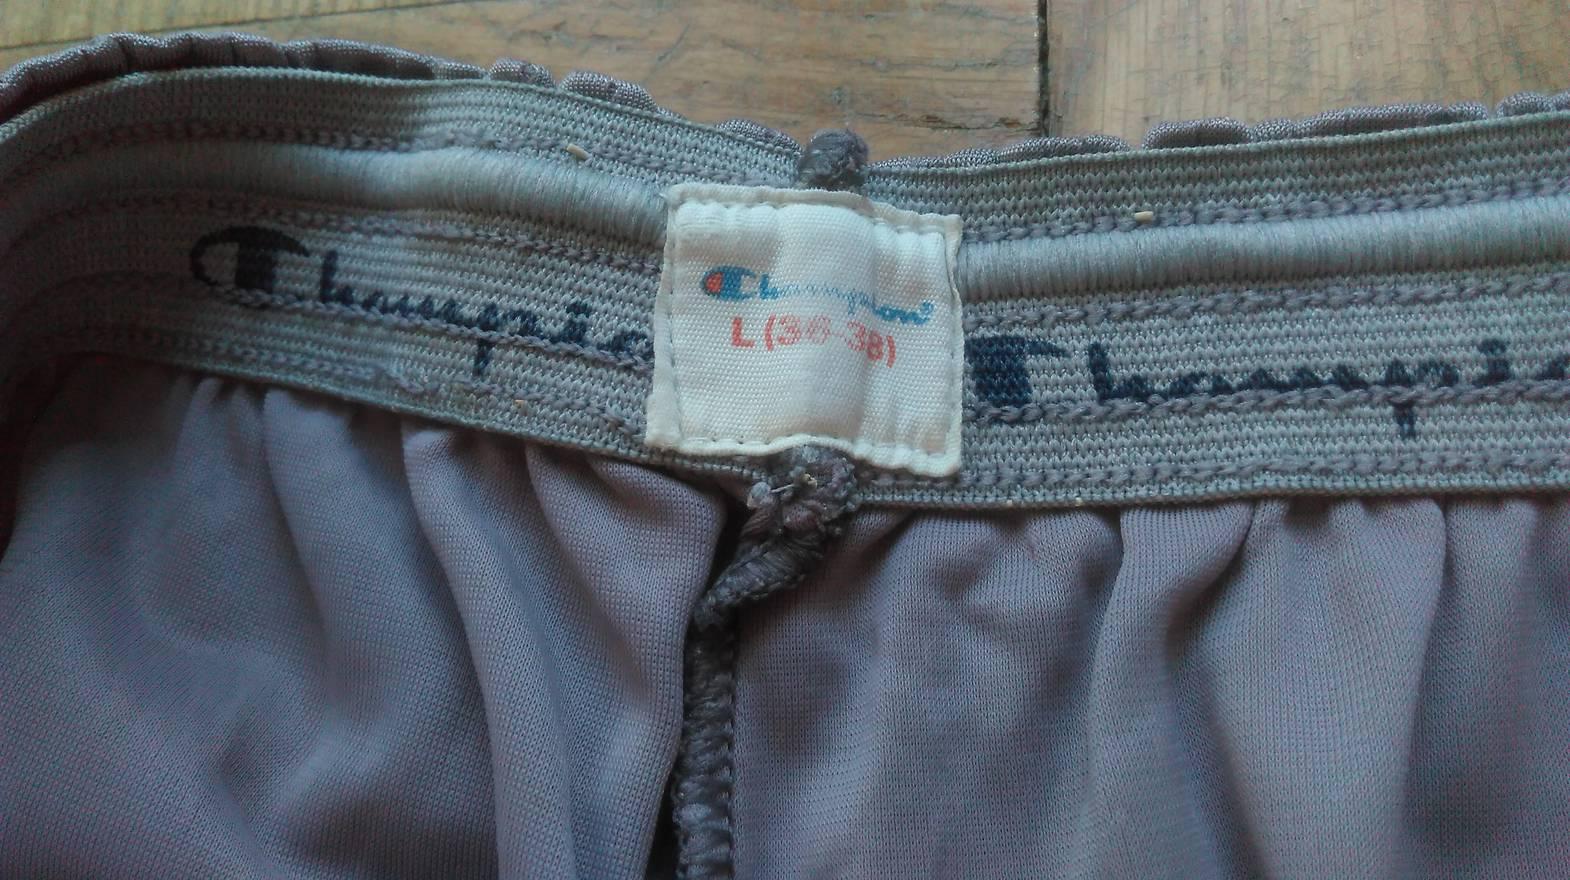 Mens basketball shorts on sale free shipping -  Vintage Original 90s Vintage Champion Shorts Waist 26 Male Shorts For Sale Men S Size Large Basketball